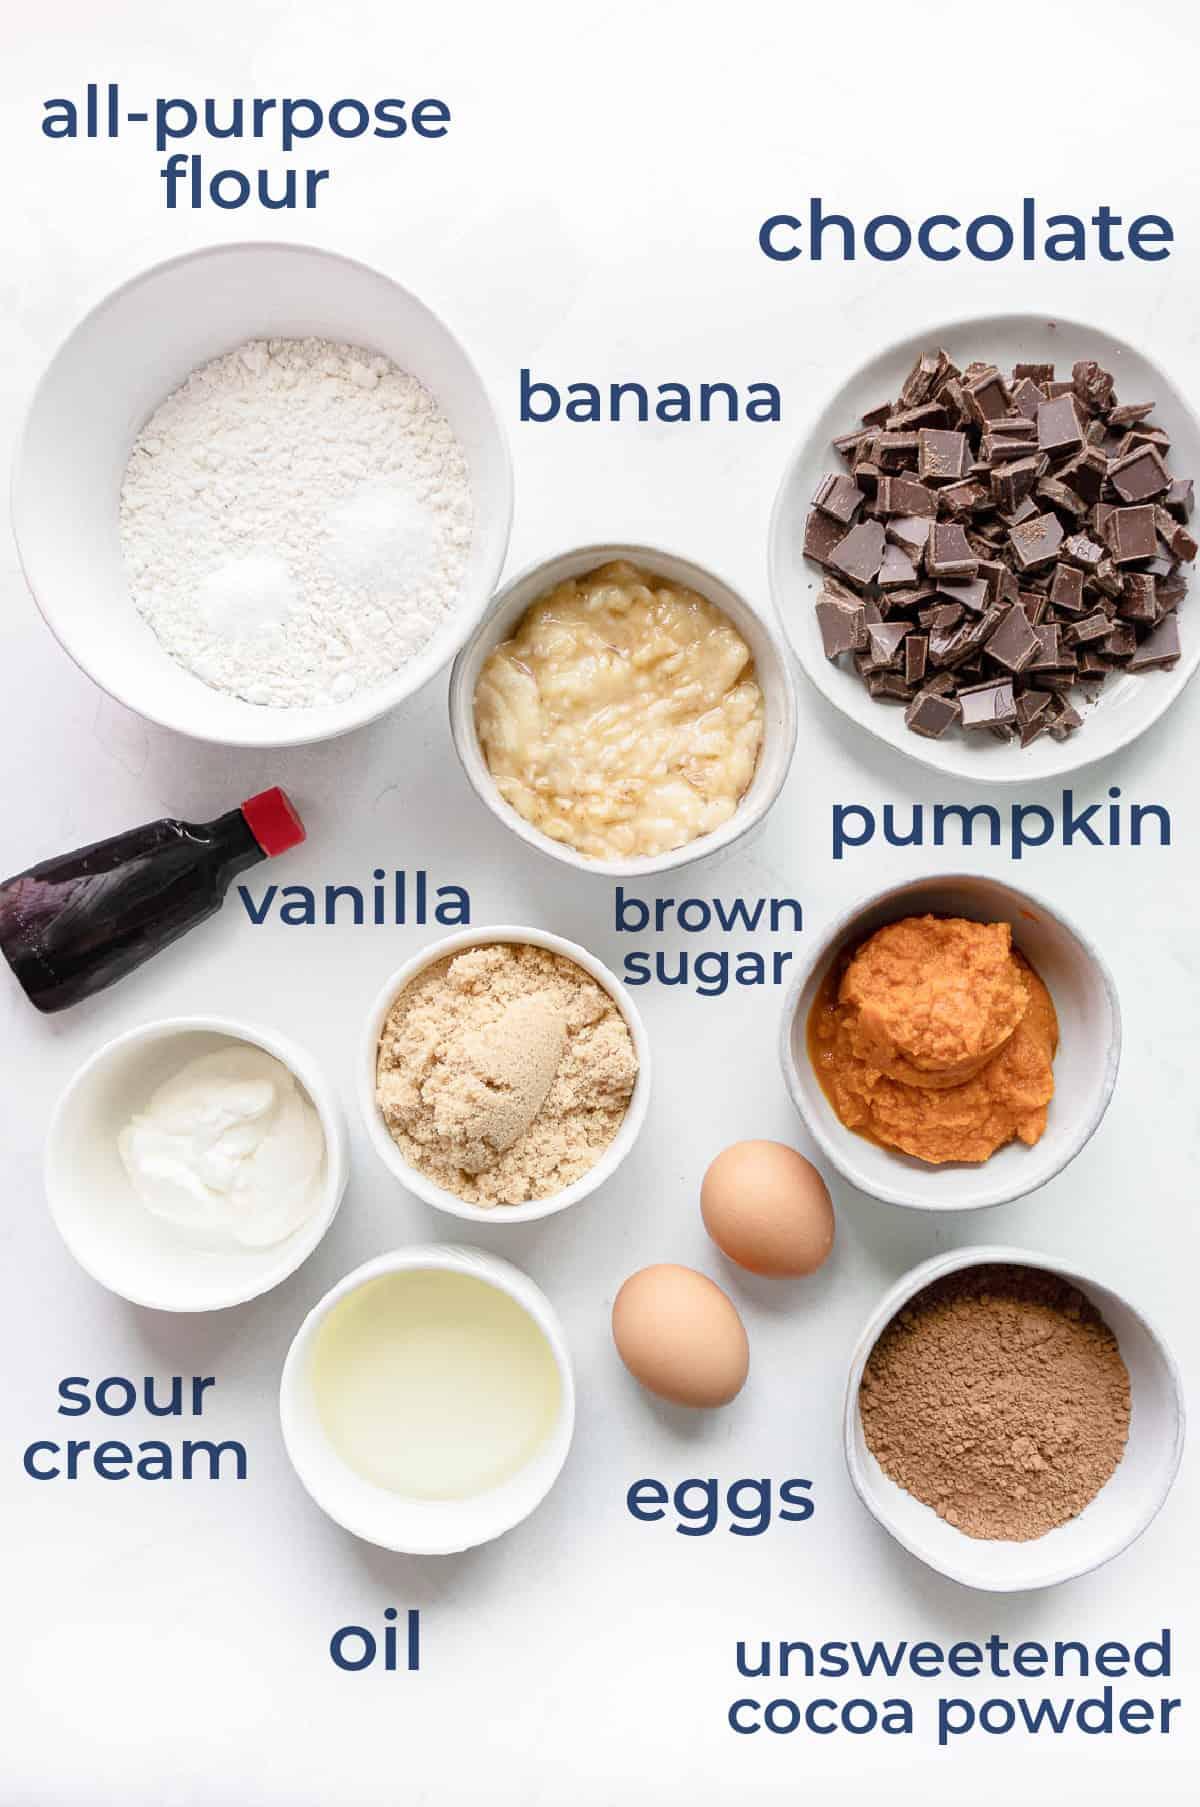 ingredients laid out, eggs, flour, chocolate chips, pumpkin, brown sugar, vanilla, cocoa powder